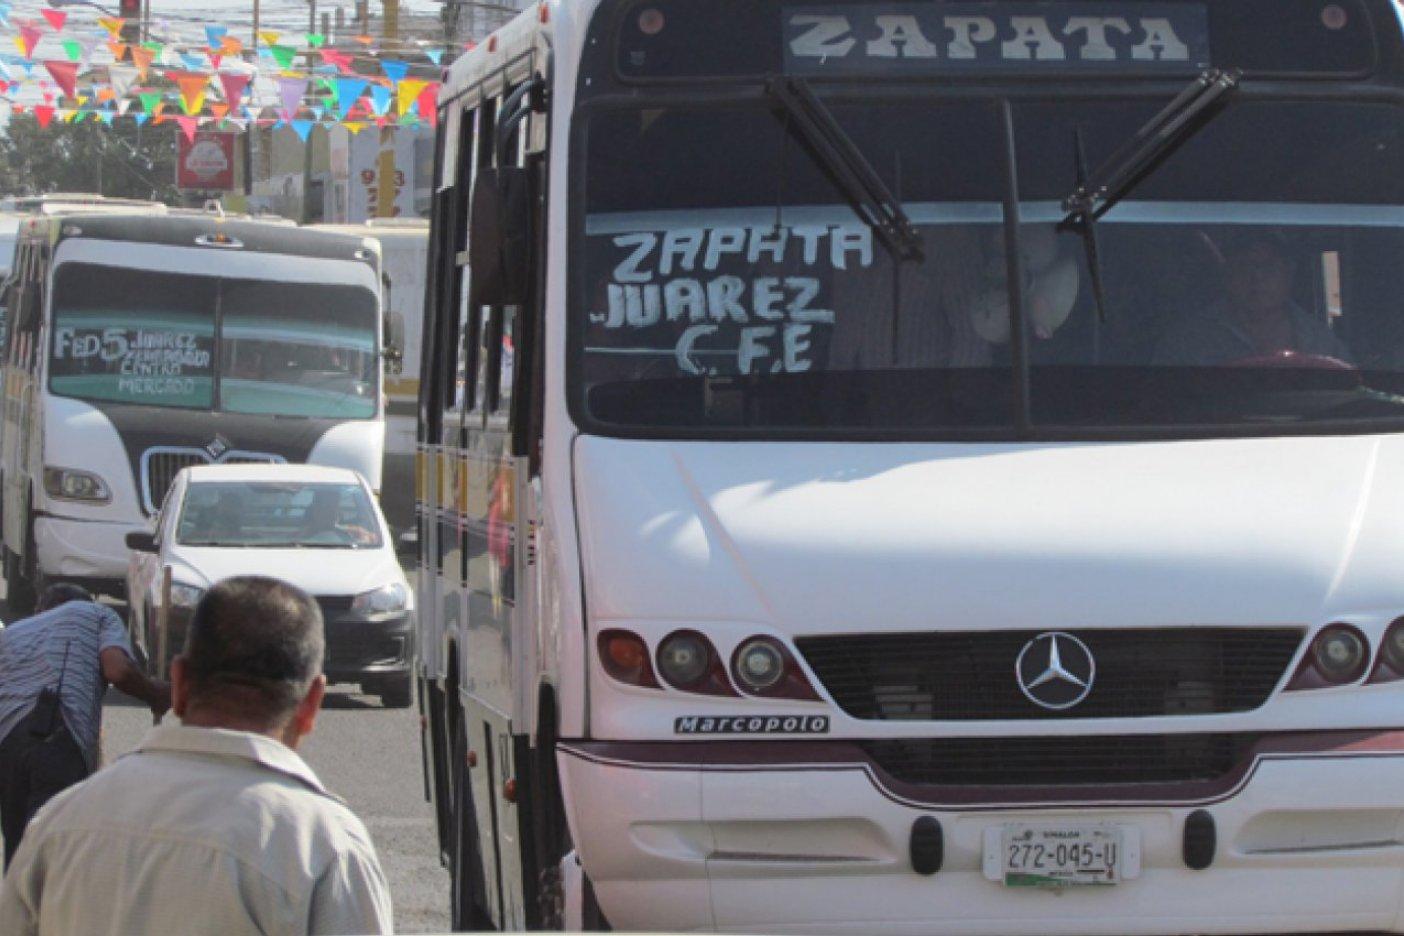 https://acsinaloa.com/wp-content/uploads/2017/08/3_M_camiones_11730-82885.jpg